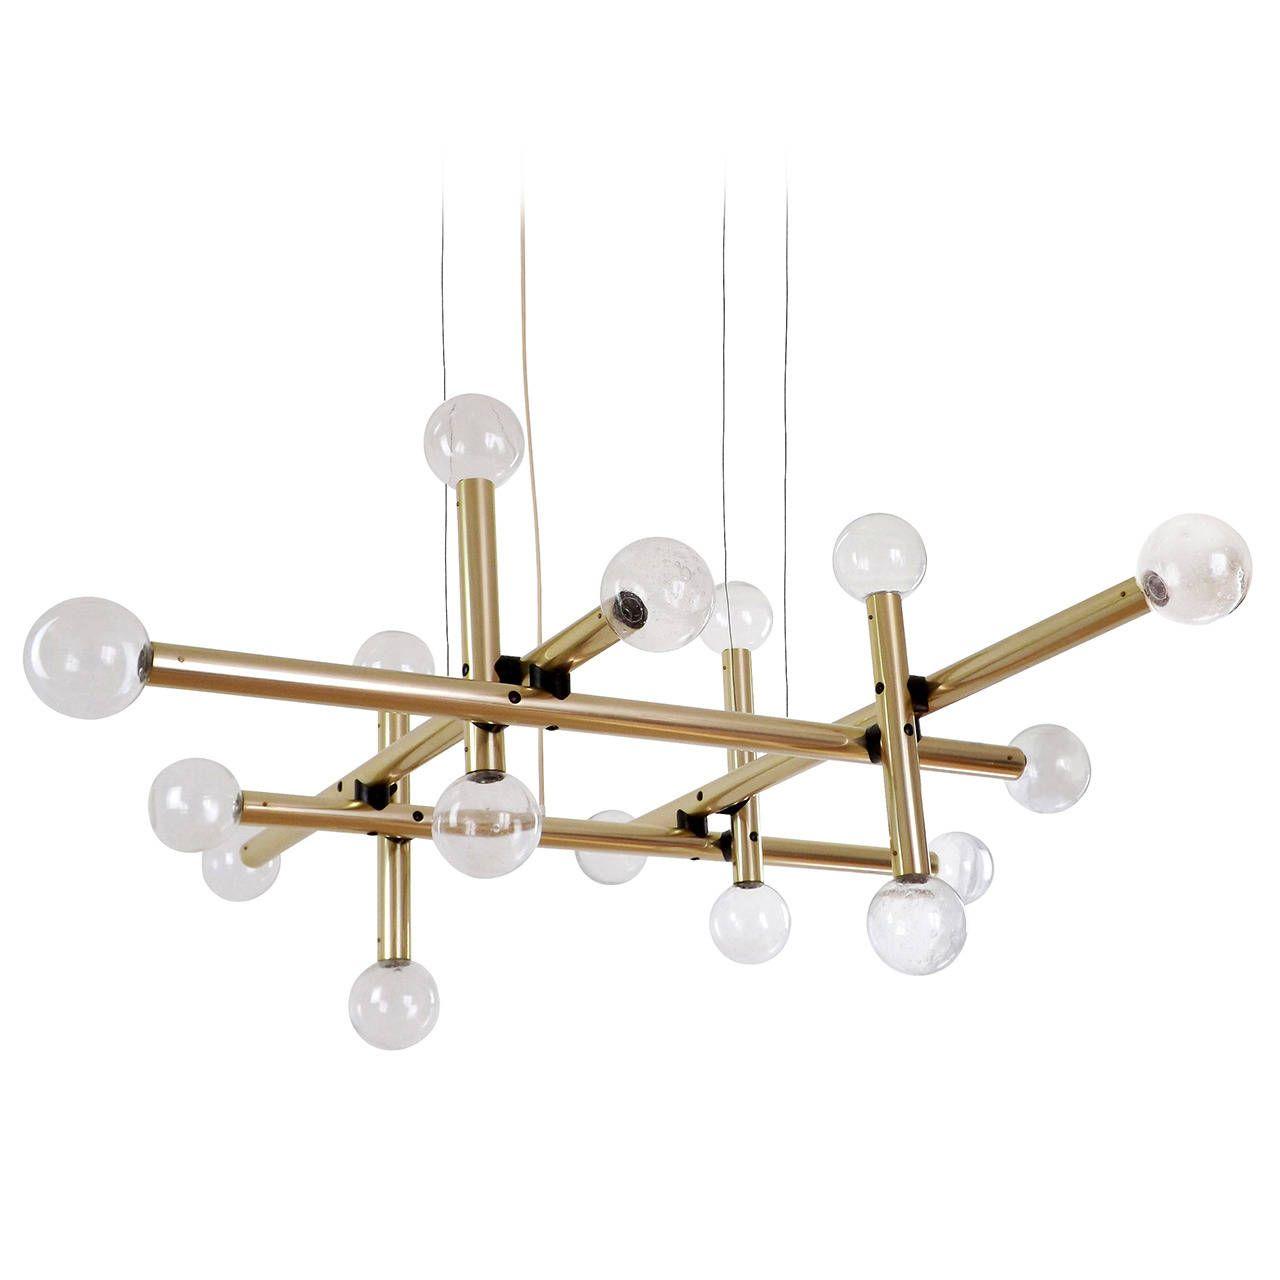 Kalmar sputnik chandelier huge atomic pendant light pair available four huge modernist atomic lamps chandeliers by kalmar from a unique collection of antique and arubaitofo Image collections